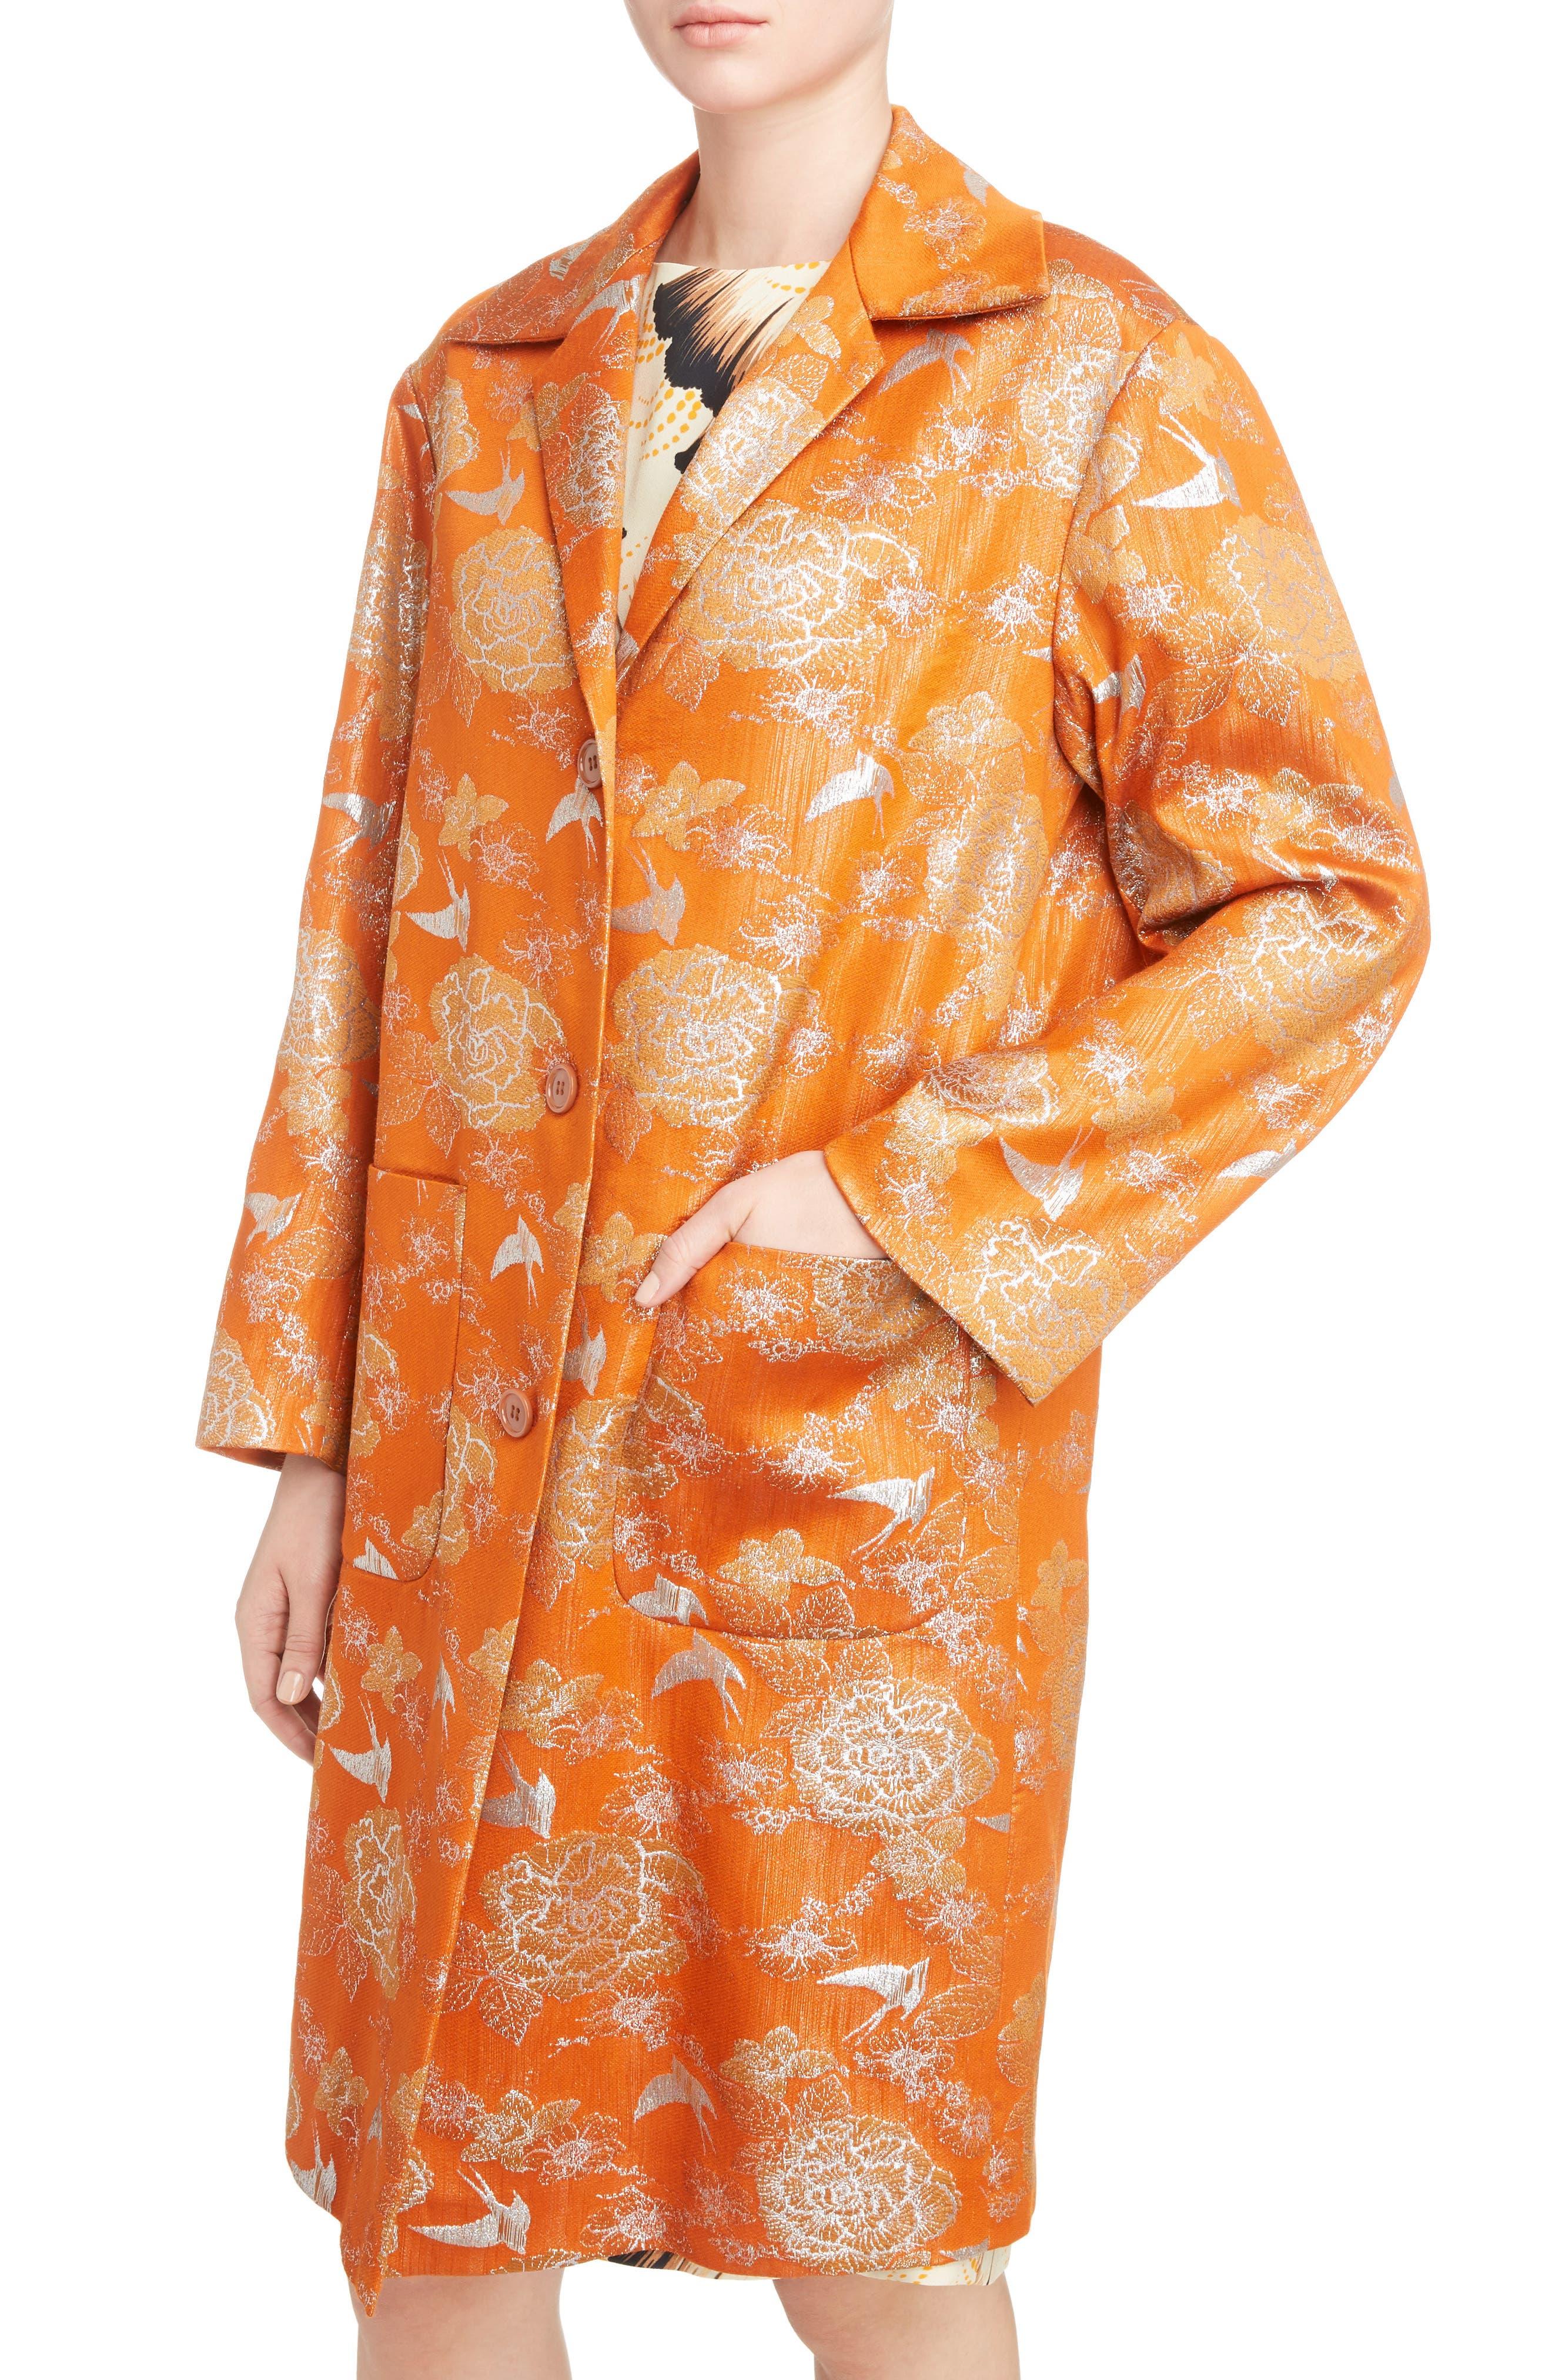 Silver Bird Jacquard Coat,                             Alternate thumbnail 4, color,                             Orange